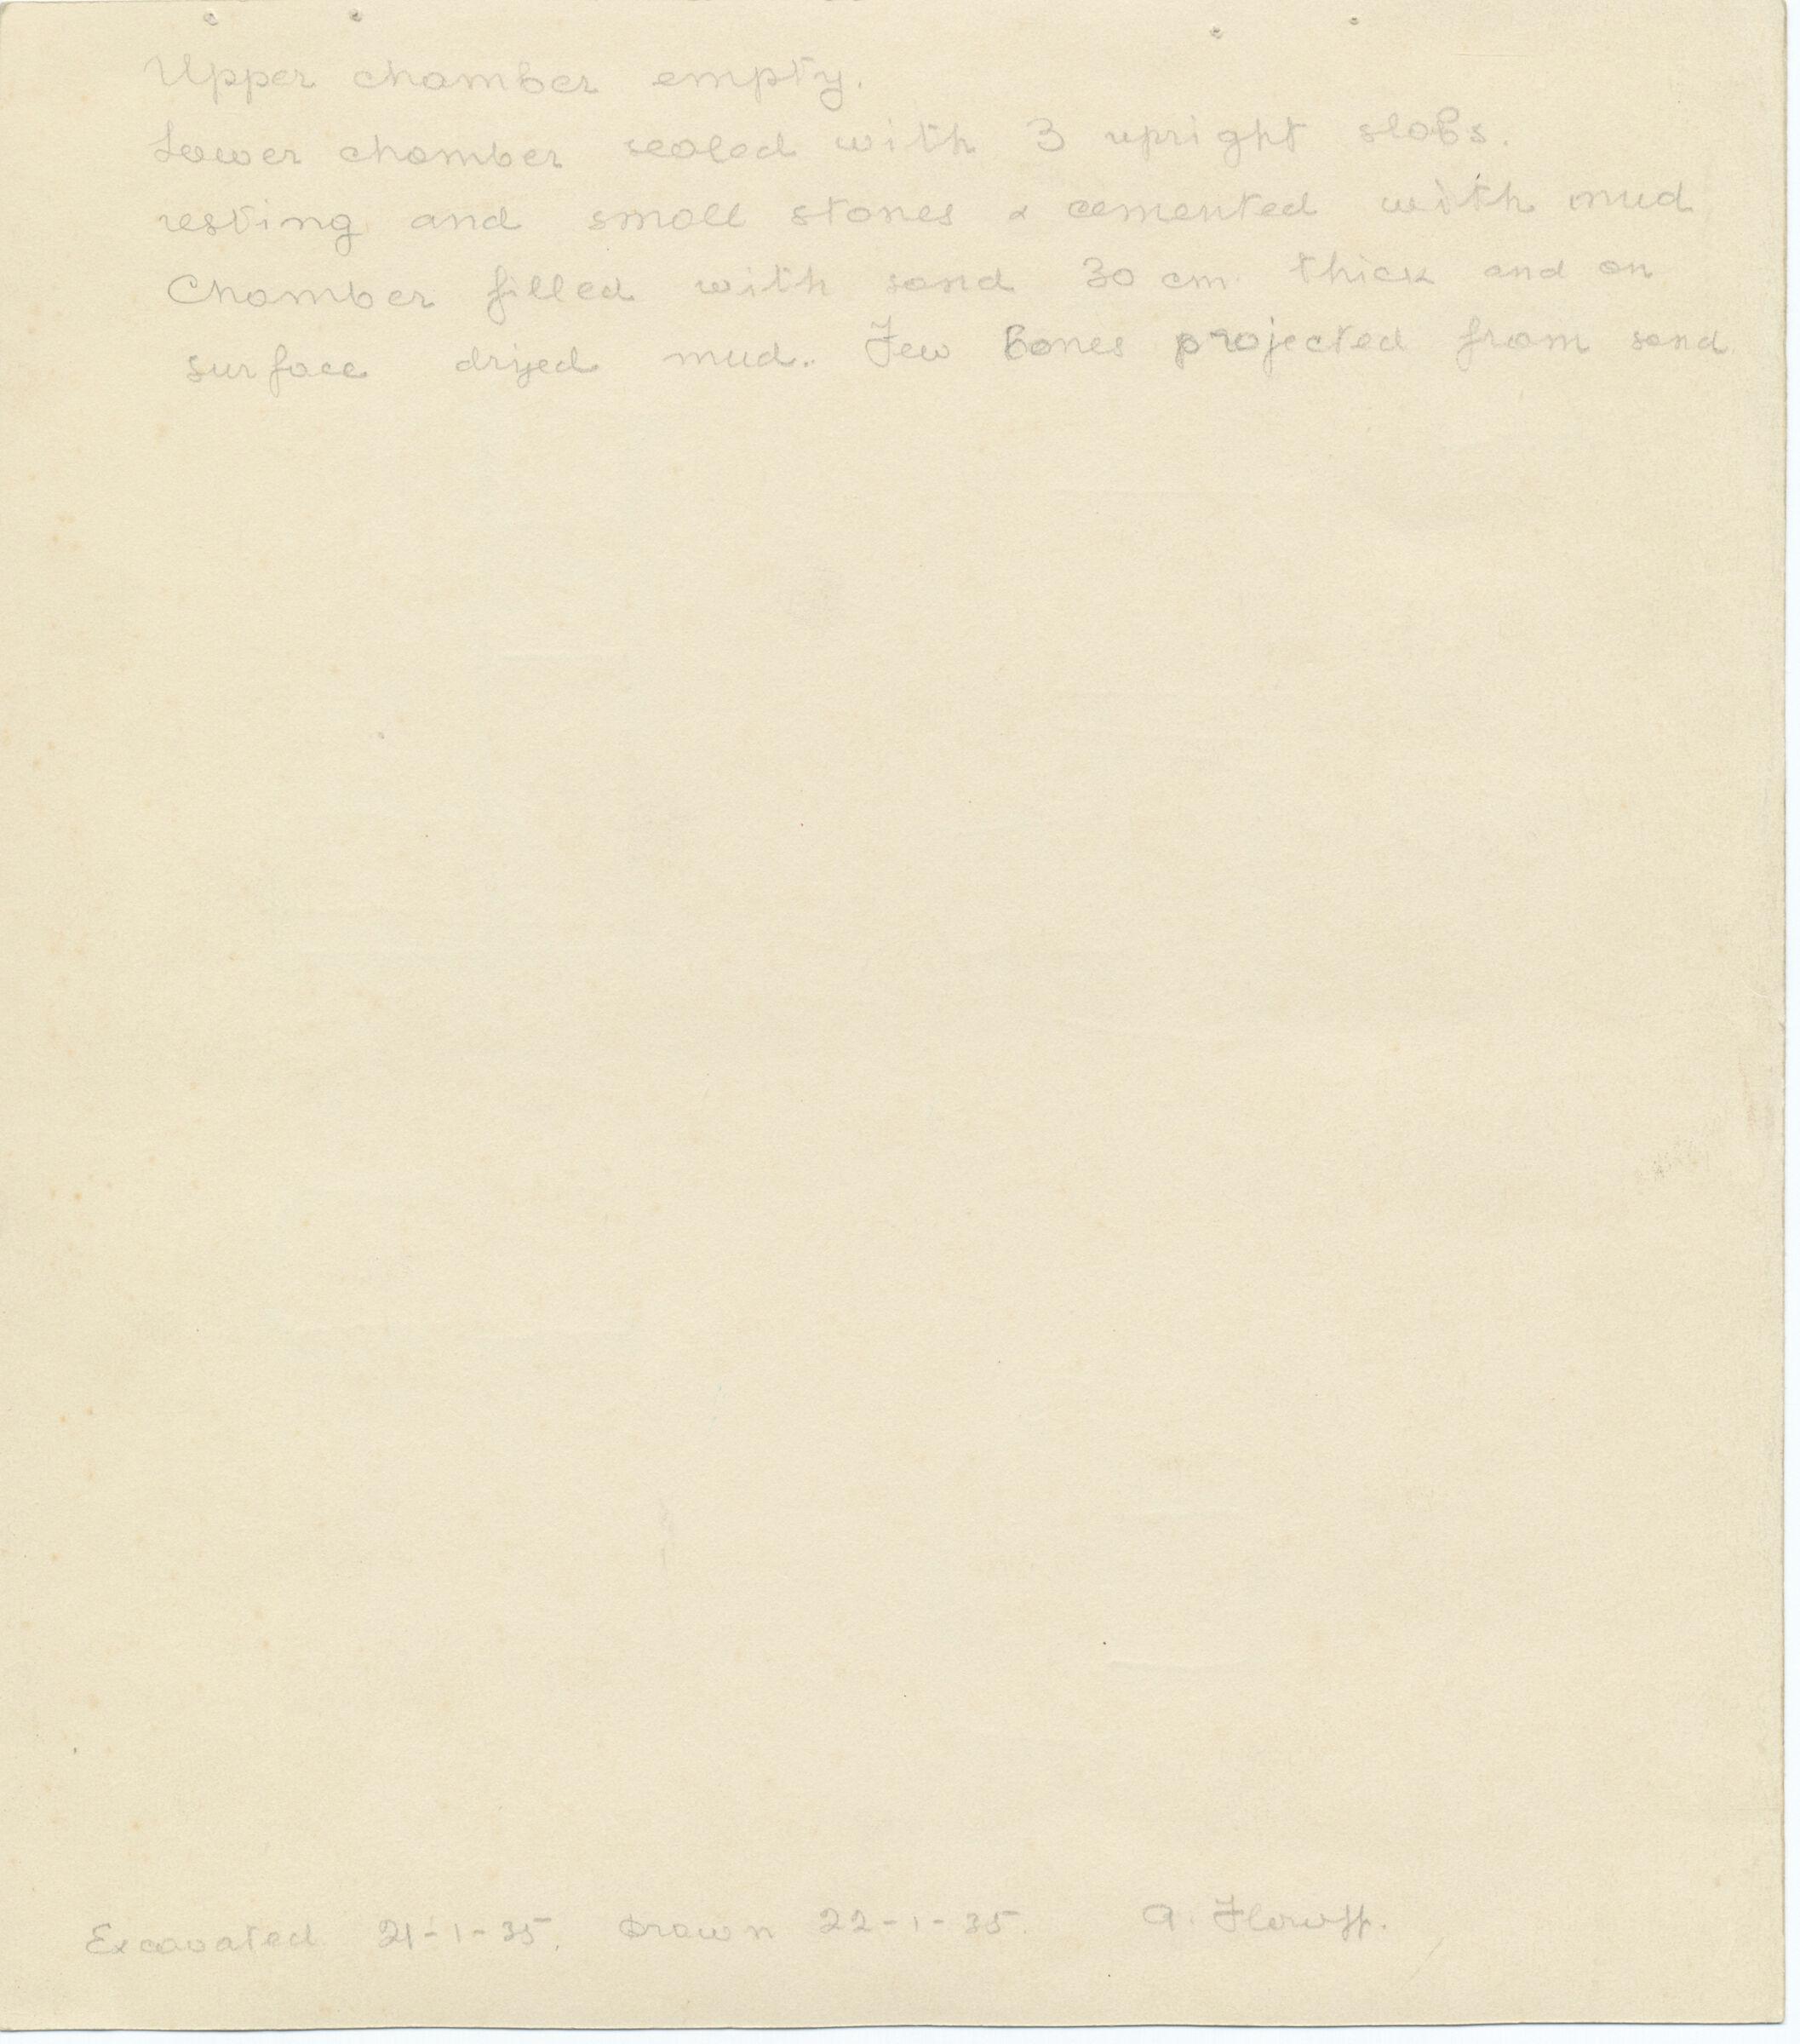 Notes: G 1047, Shaft D, notes